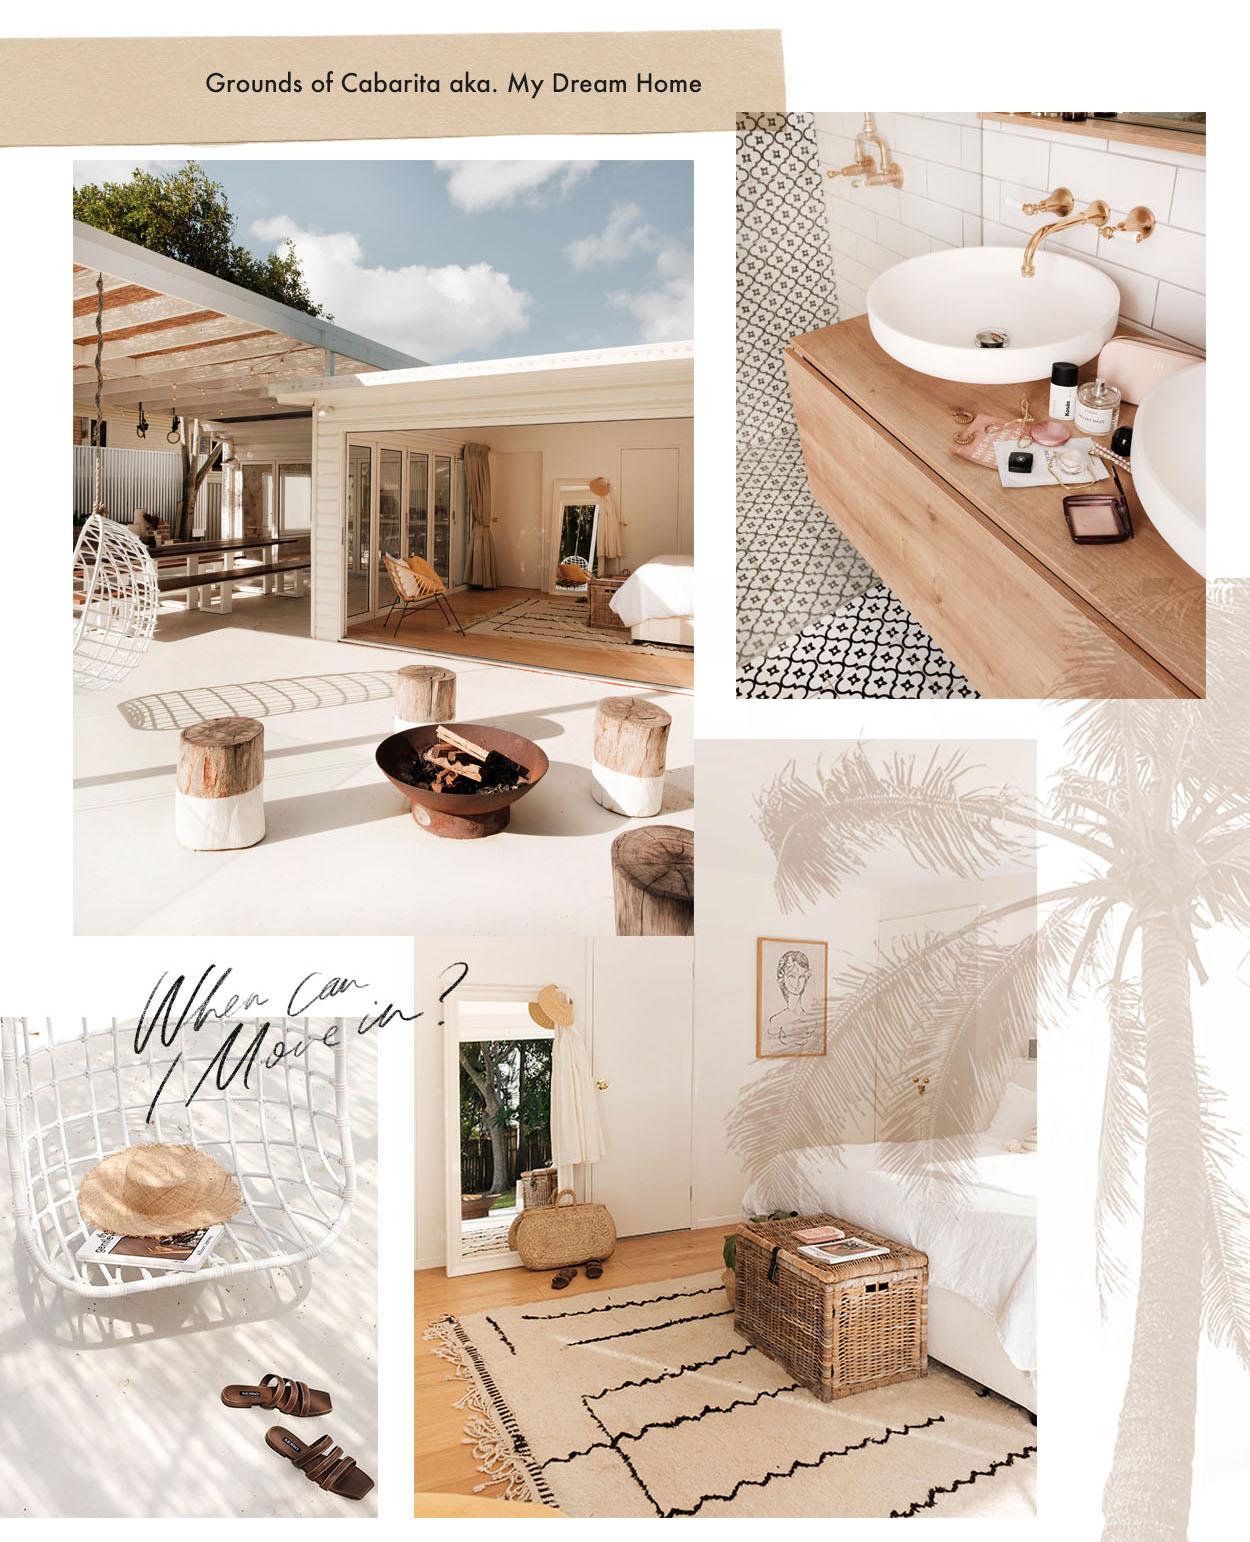 CabaritaBeachBlogPost-Home.jpg